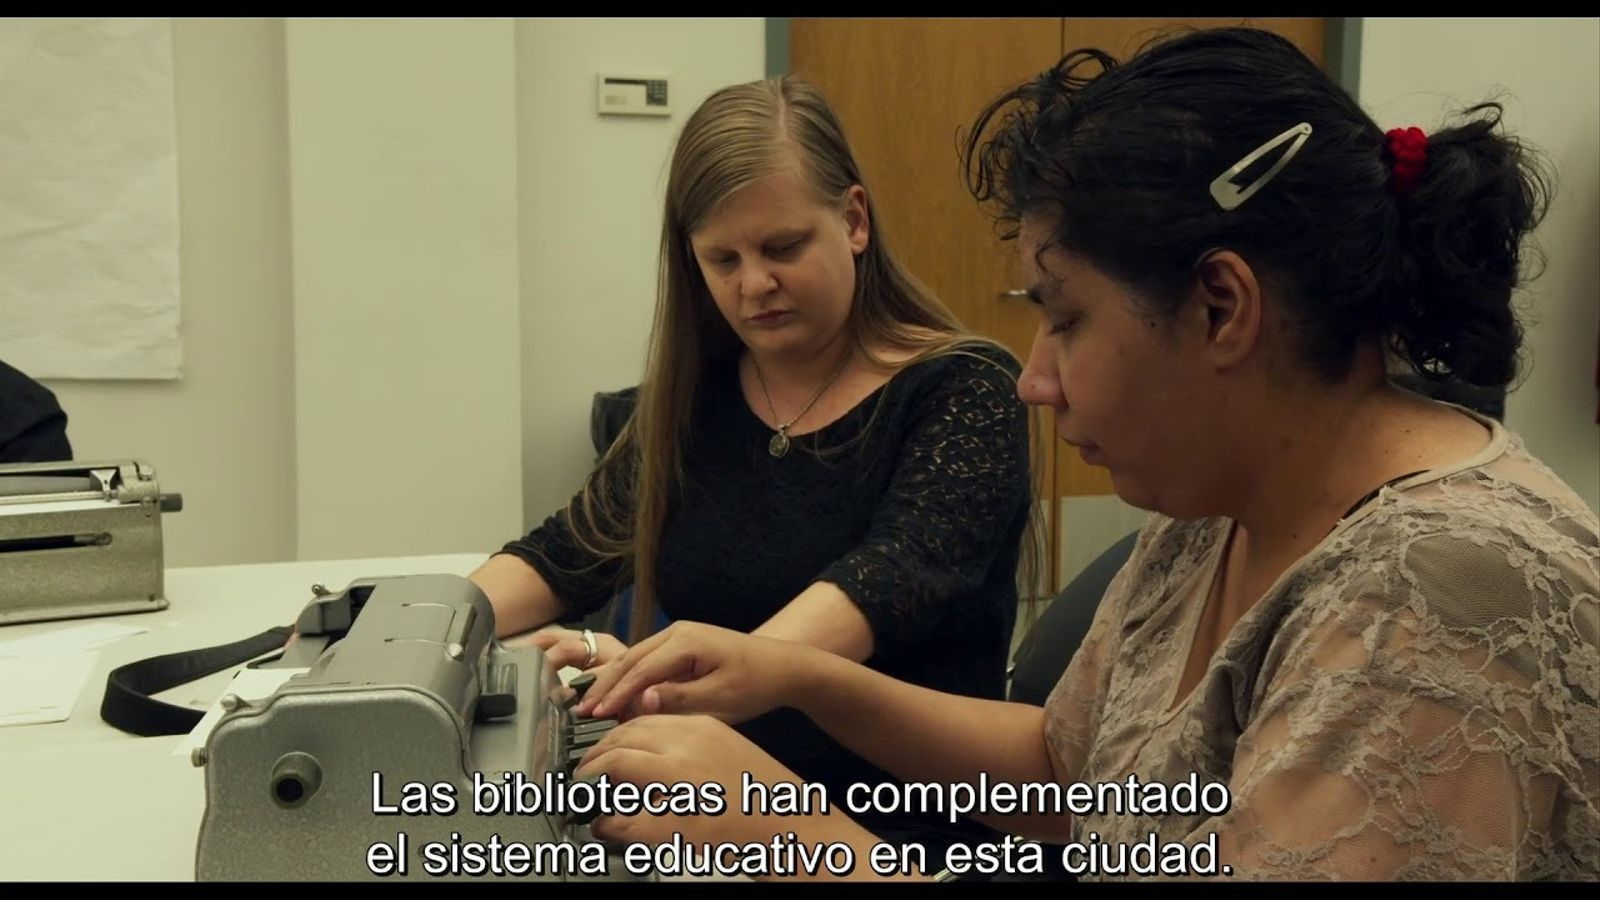 Tràiler del documental 'Ex libris'